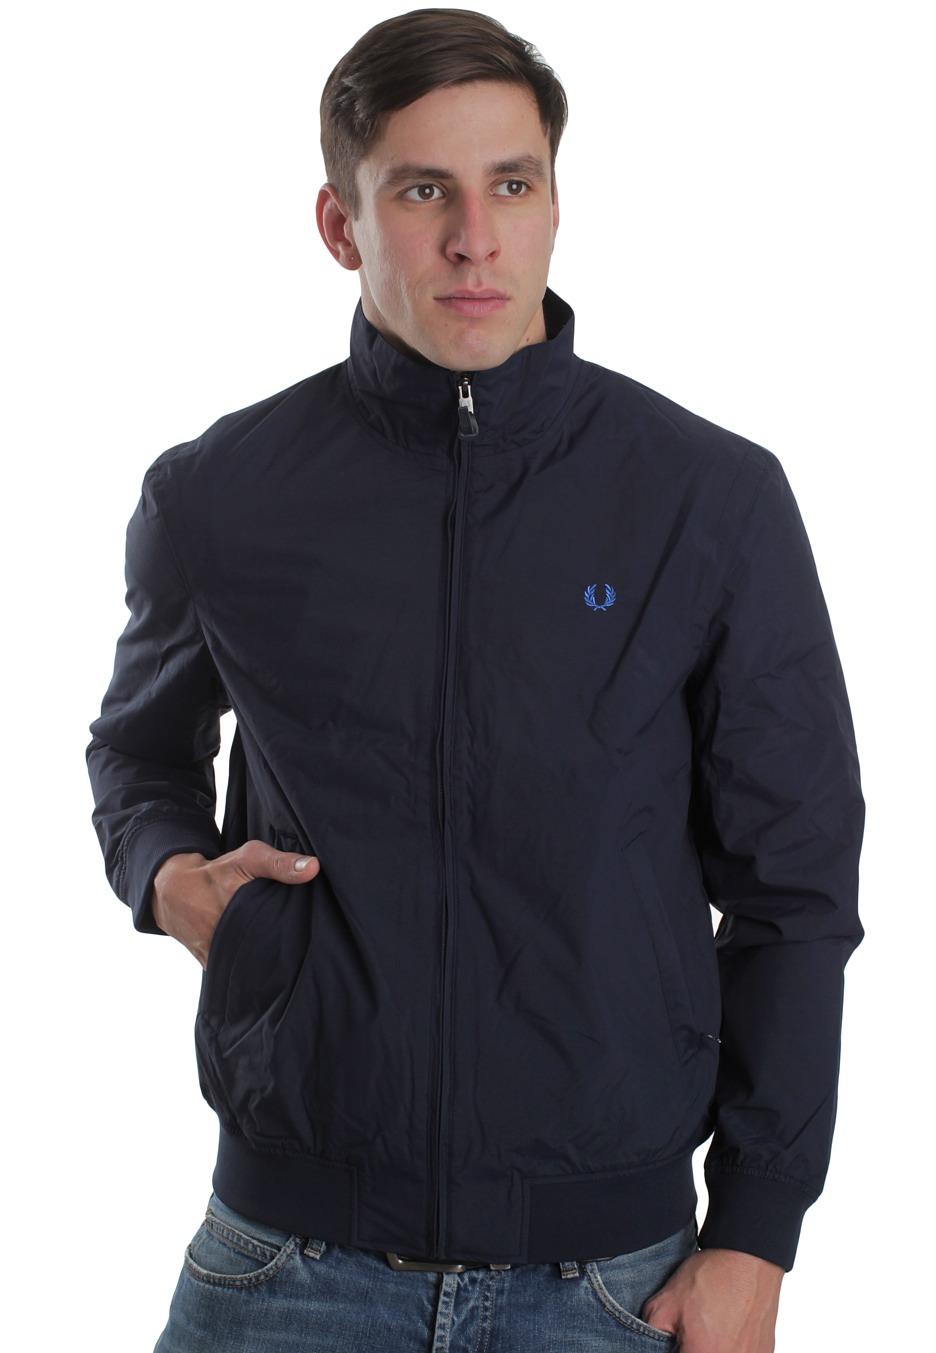 fred perry sailing blue granite jacket streetwear shop worldwide. Black Bedroom Furniture Sets. Home Design Ideas